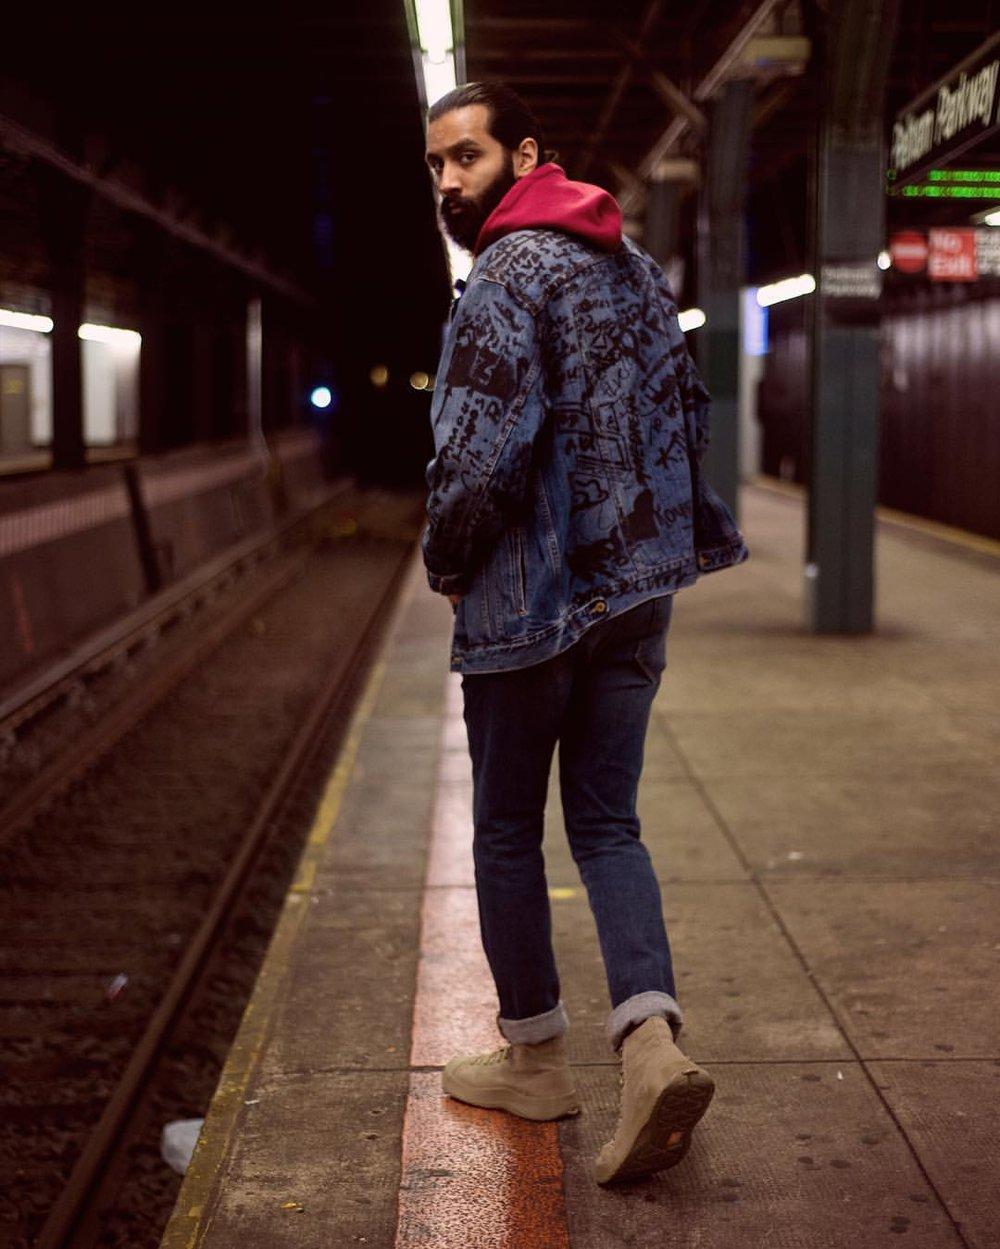 Currently creating 🔃  #NorthofMAN •  Framed by @LifeinReverie •  .  .  .  .  .  #mensfashion #style #blogger #stylish #editorial #dappercollection #maleblogger #menswear #newyork #streetstyle #mensfashionreview #pursuitofportraits #mnswrmagazine #dapperculture #editorialphotography #streetwear #hypebeast #highsnobiety  #cfda #portrait #model #menswear  #snobshots #shareyourstreetstyle #fashionphotographer  #nymodel #nikonnofilter #streetdreamsmag  #highfashion (at Bronx, New York)